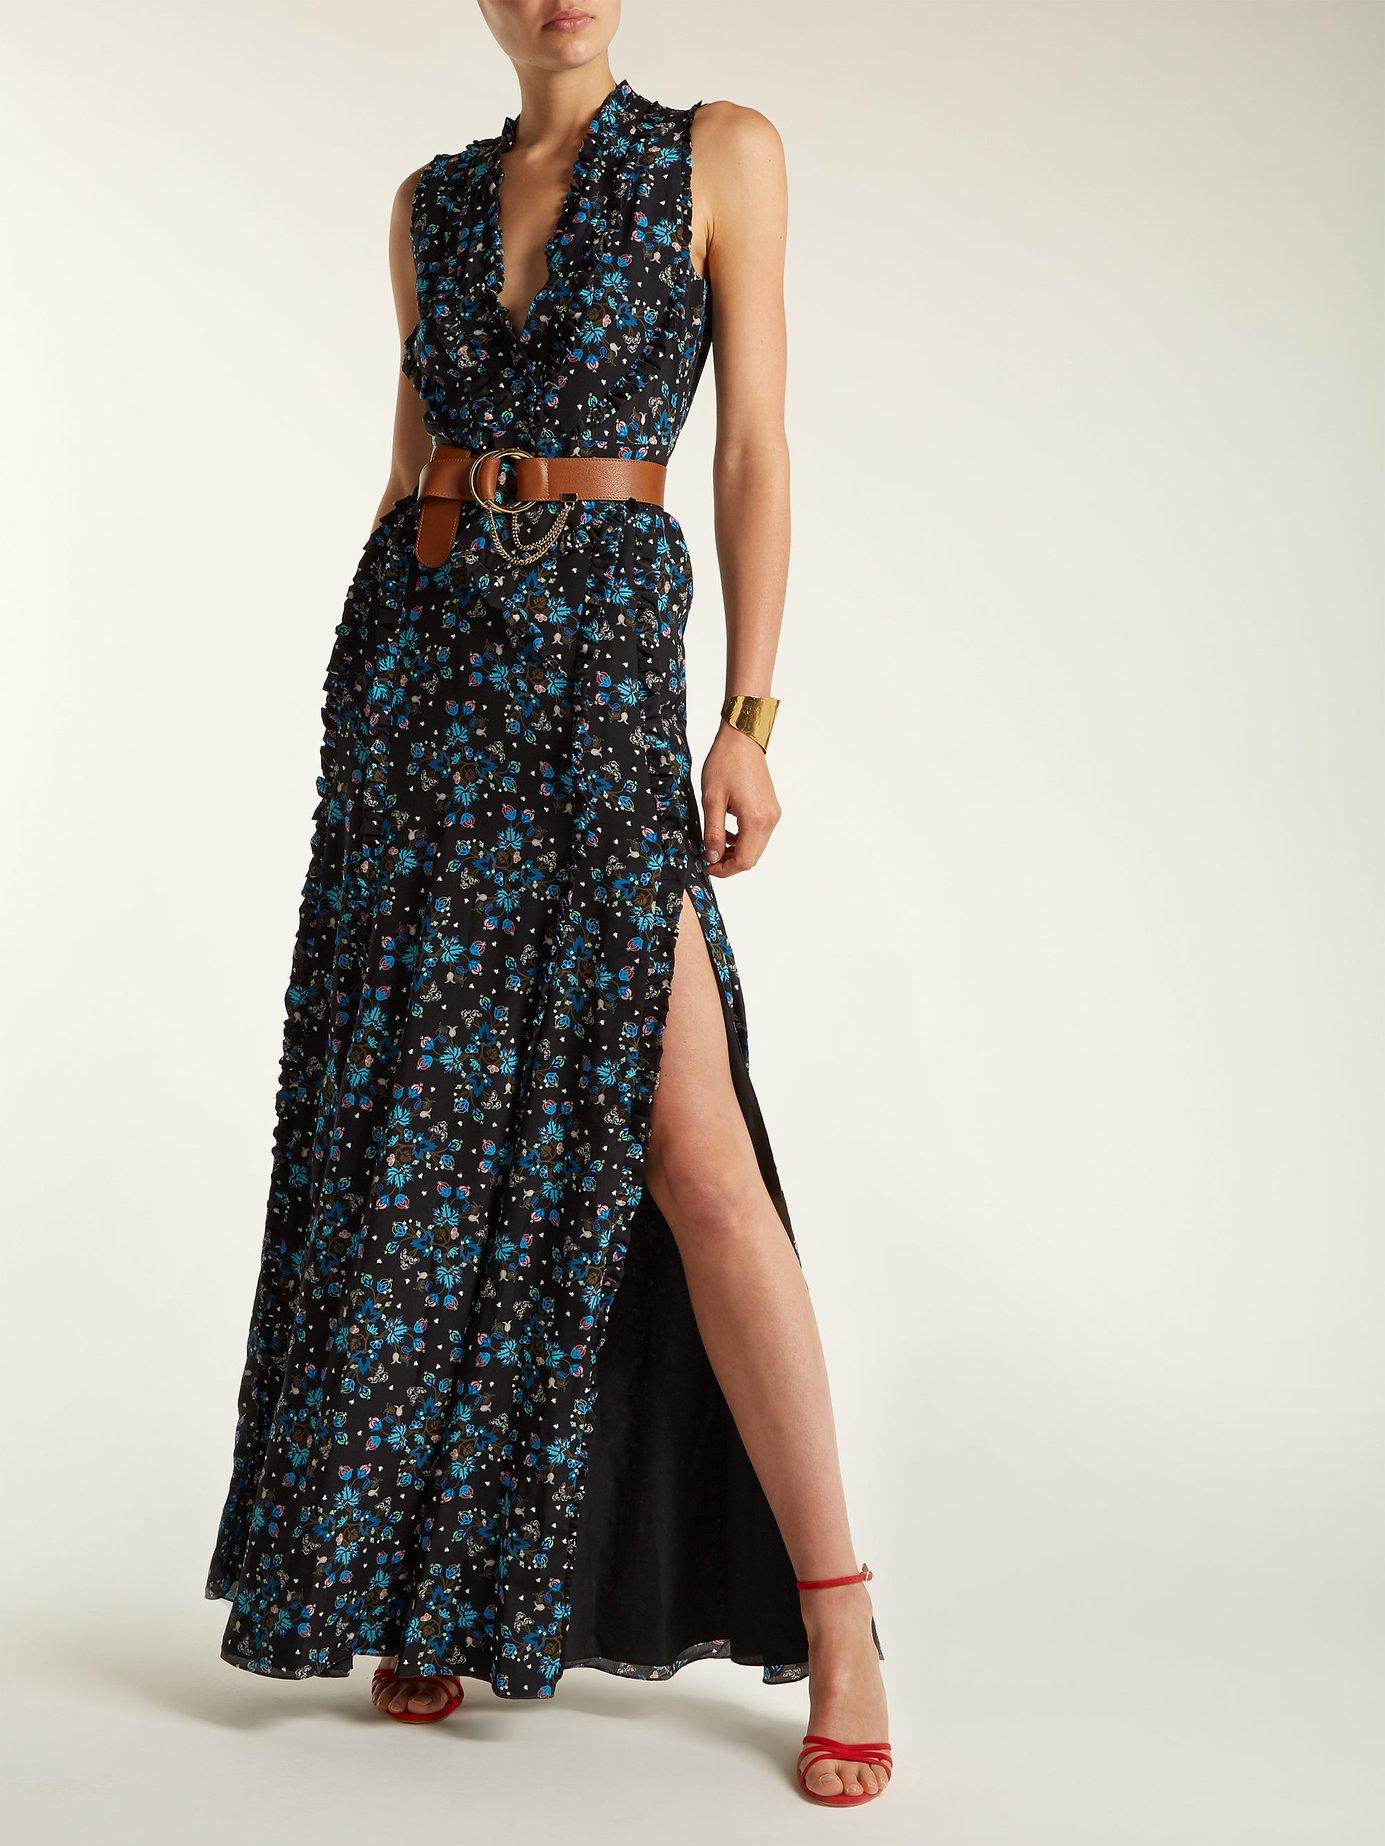 Medina Vine-print silk crepe de Chine dress by Altuzarra